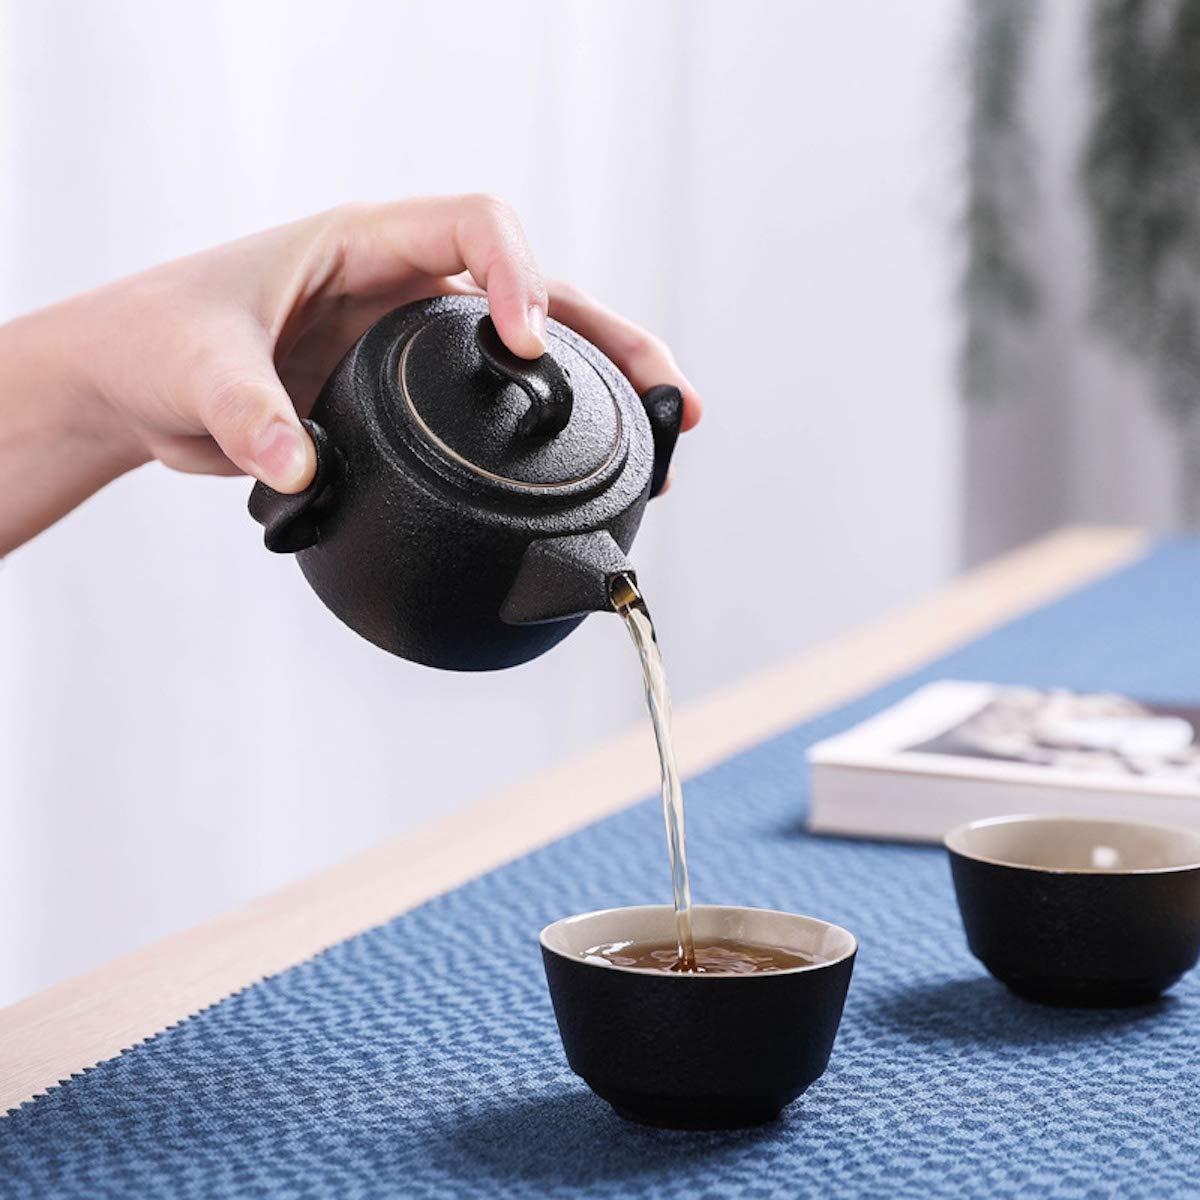 Porcelain Teapot /& Teacups /& Bamboo Tea Tray /& Tea Mat with a Portable Travel Bag Black 3 OMyTea 100/% Handmade Chinese//Japanese Vintage Kungfu Gongfu Tea Set